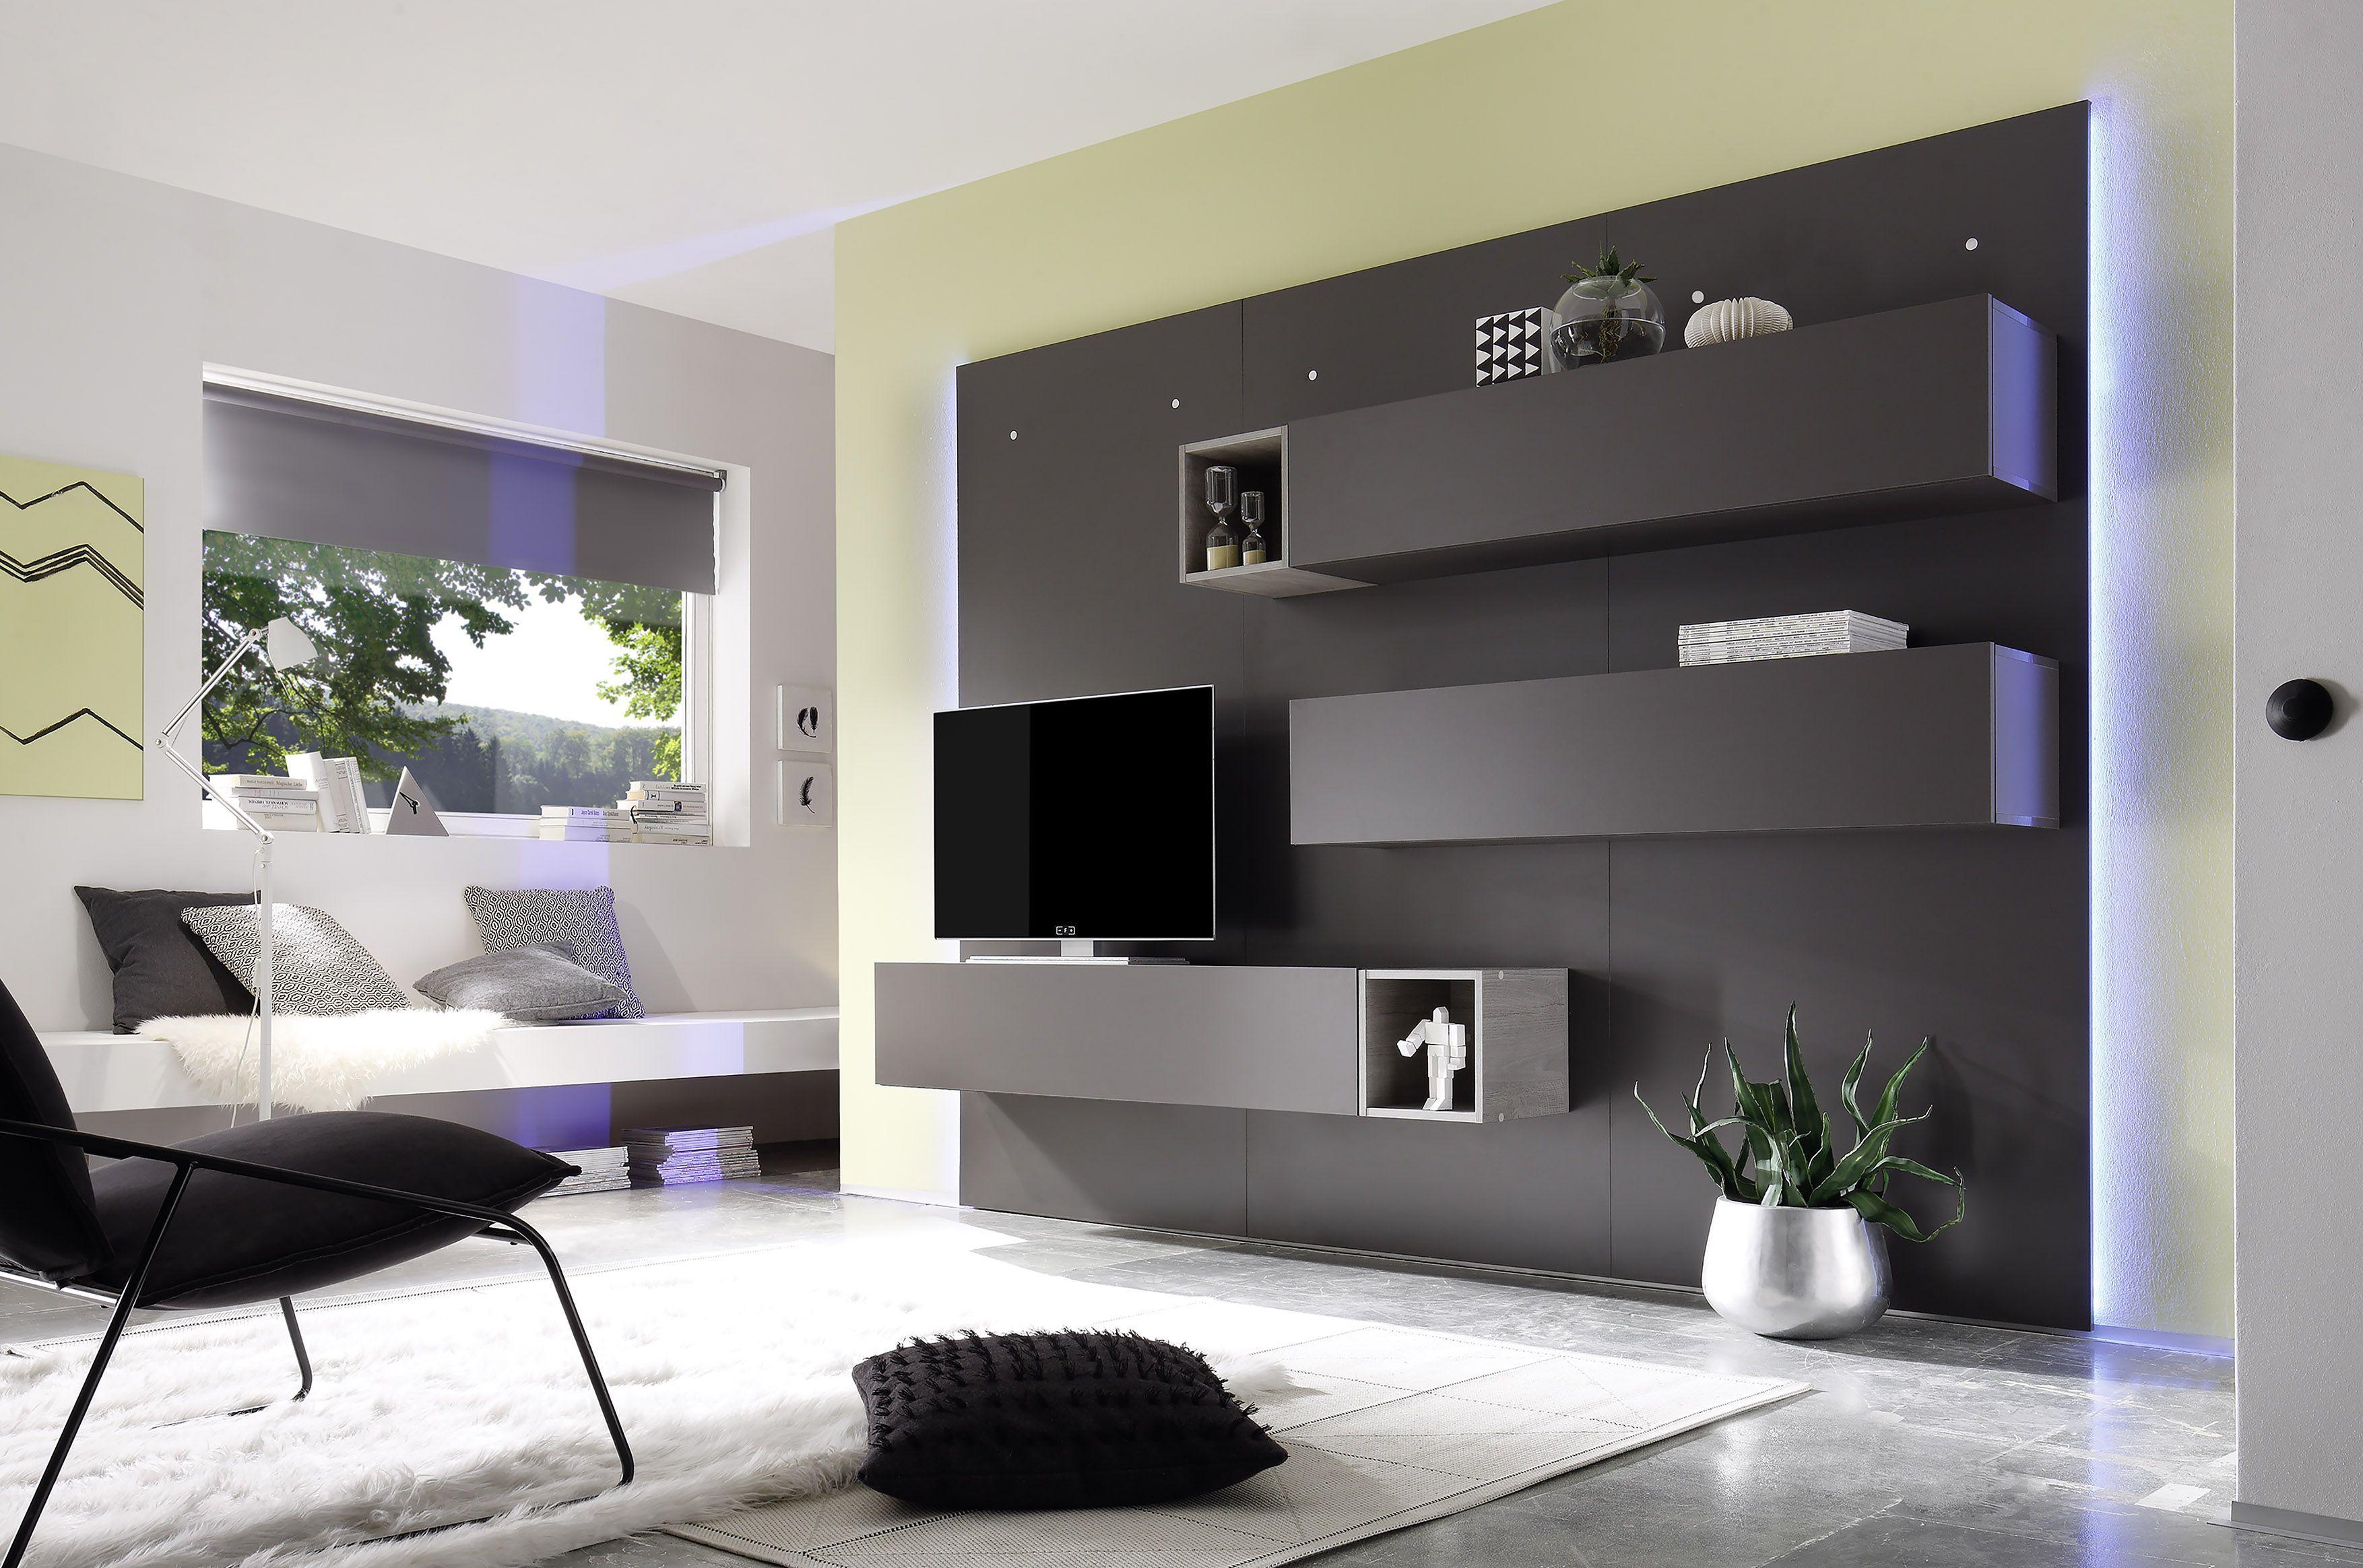 Wohnwand 2 CASINO II Dunkelgrau/Eiche Grau | Rund Um Das Eigene Haus |  Pinterest | Dunkelgrau, Eiche Und Grau